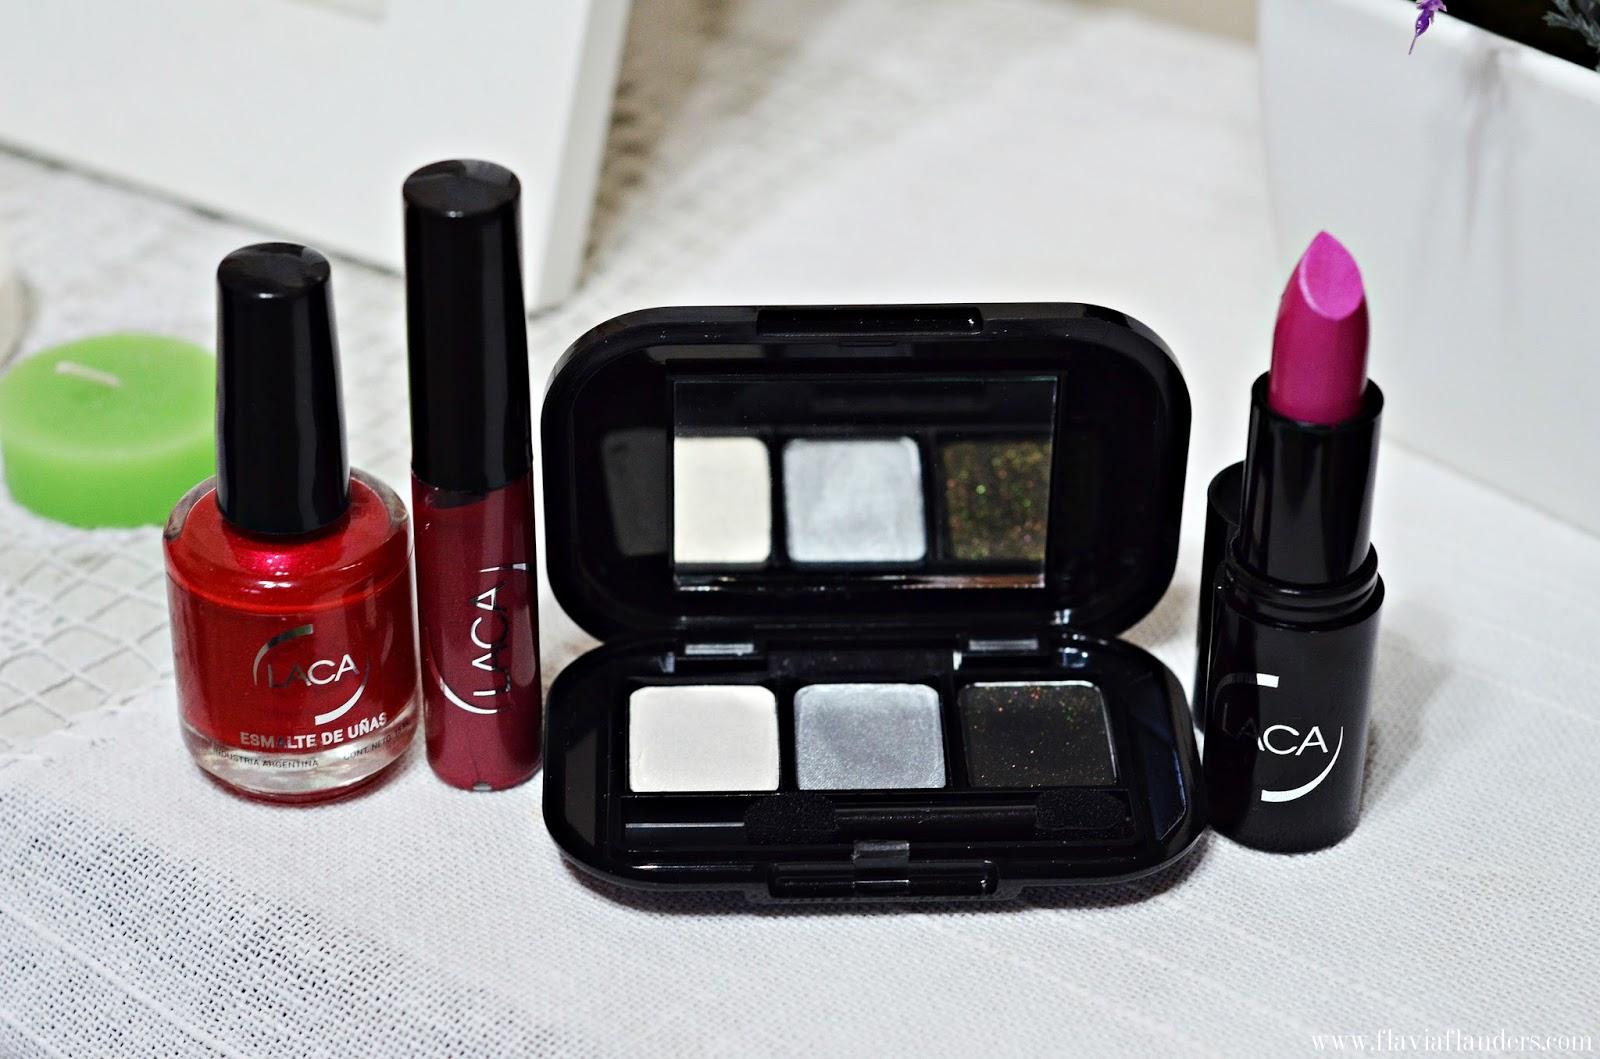 laca, laboratorio laca, maquillaje laca, beauty blogger, beauty blogger argentina, giveaway, sorteo, sorteo internacional, international giveaway